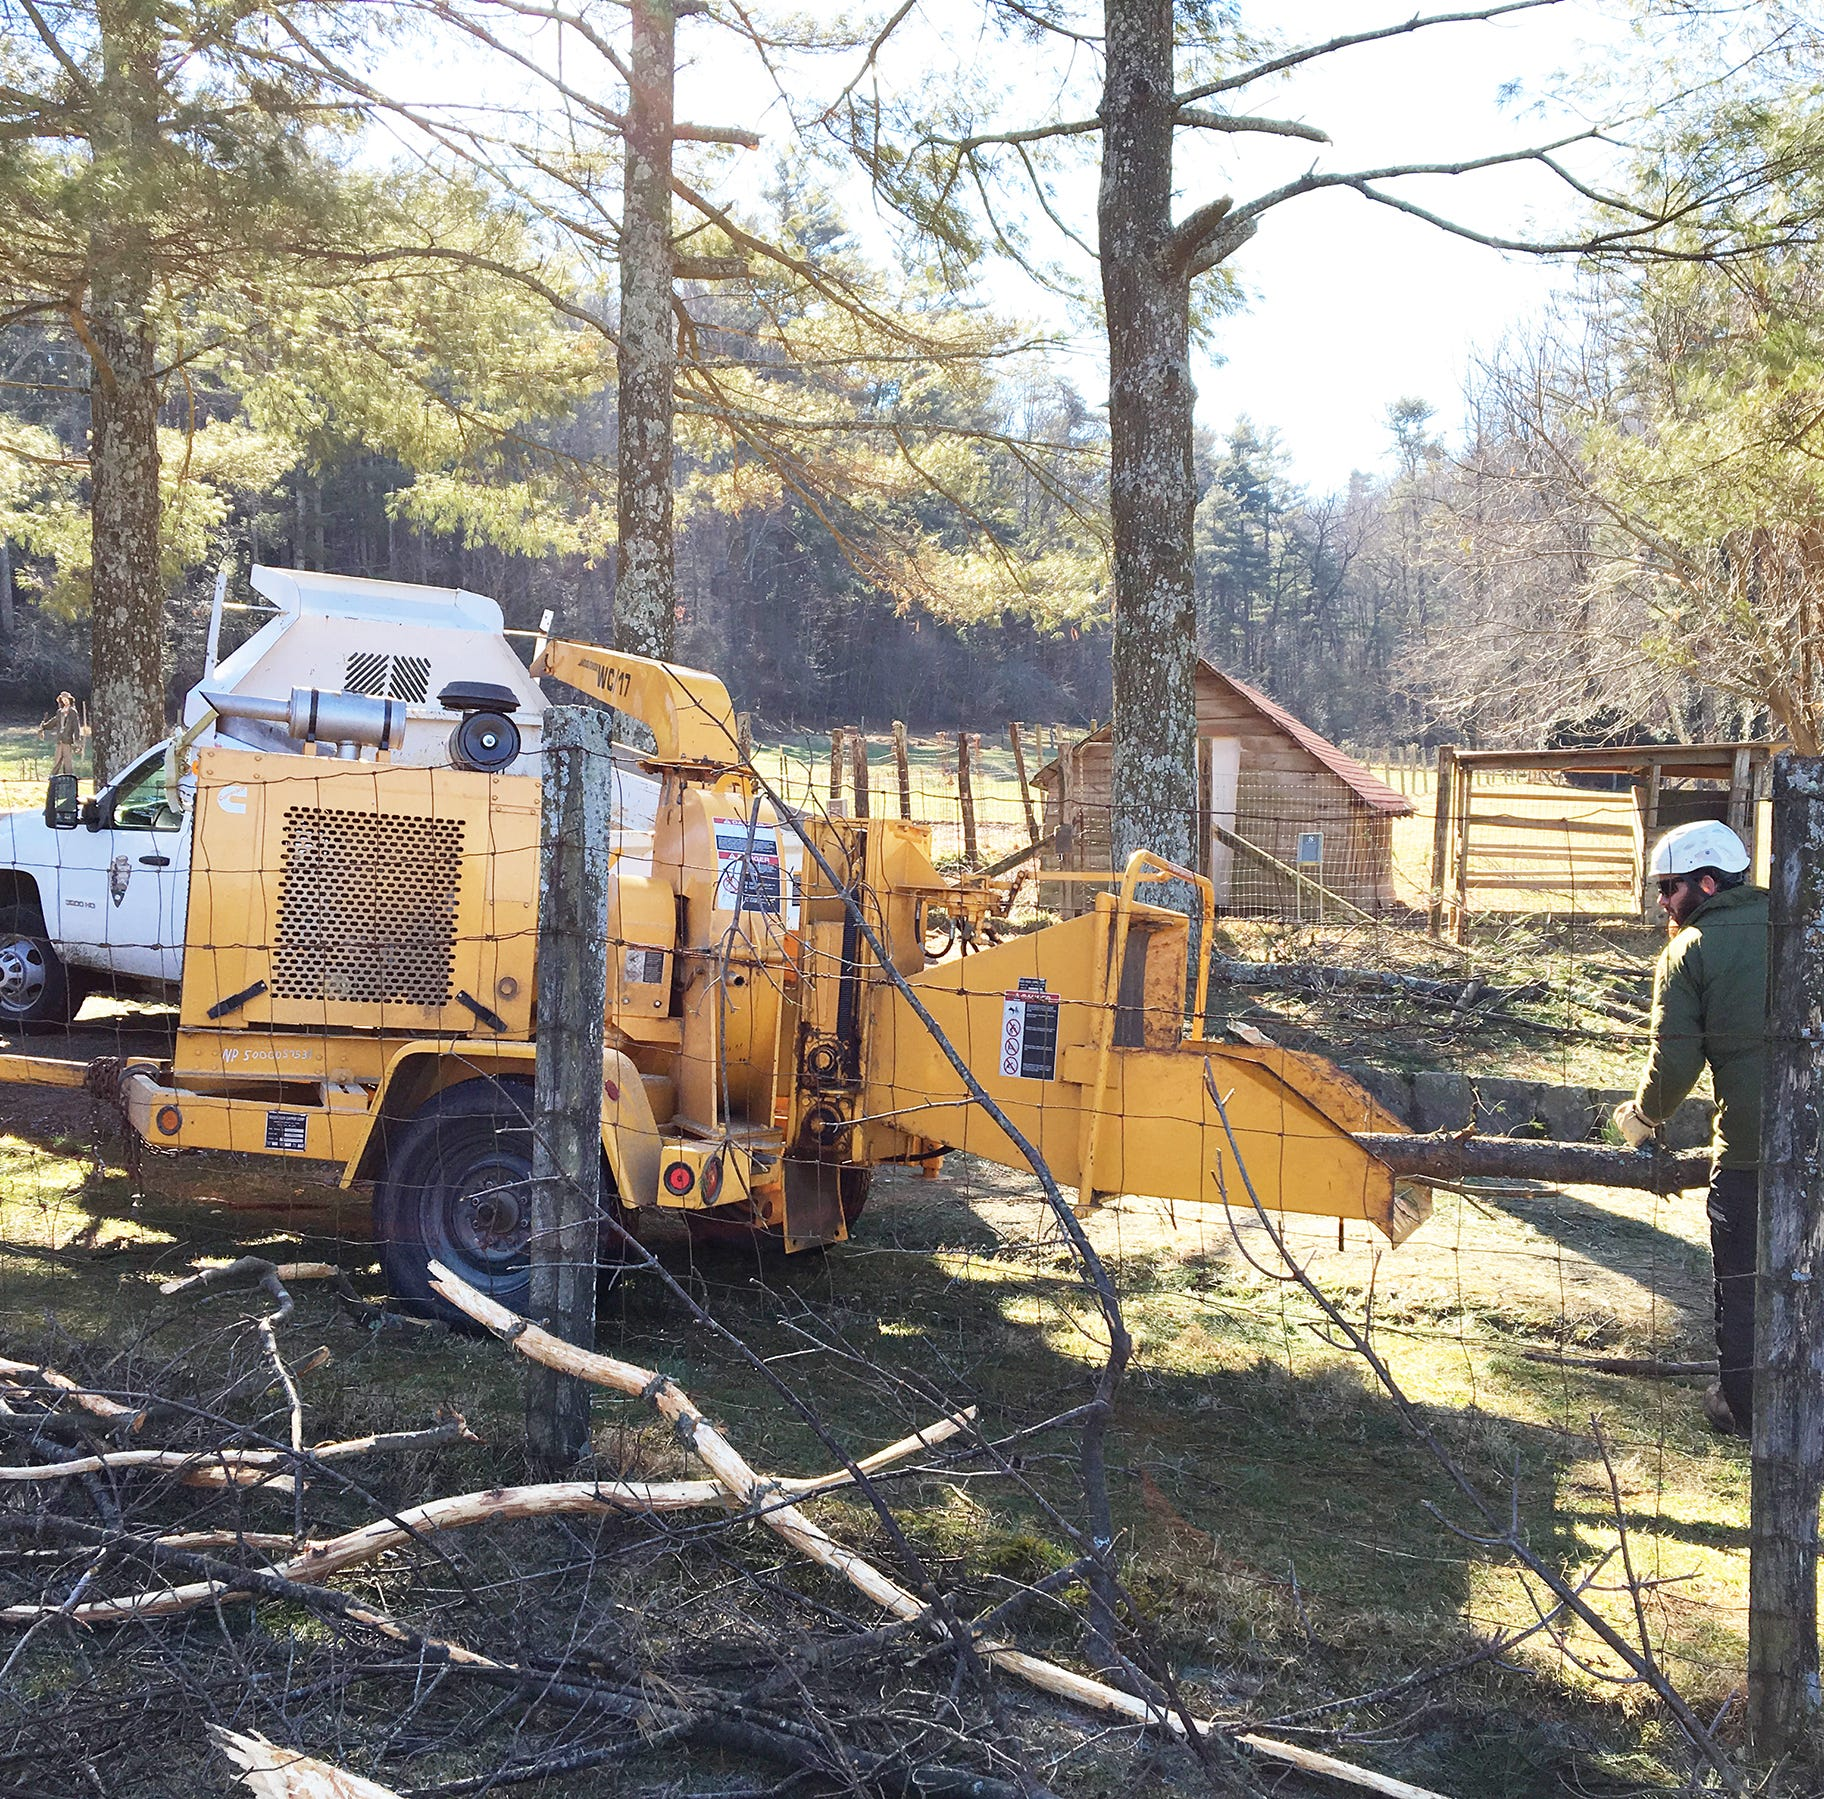 Carl Sandburg Home remains closed as staffers remove hazard trees, limbs